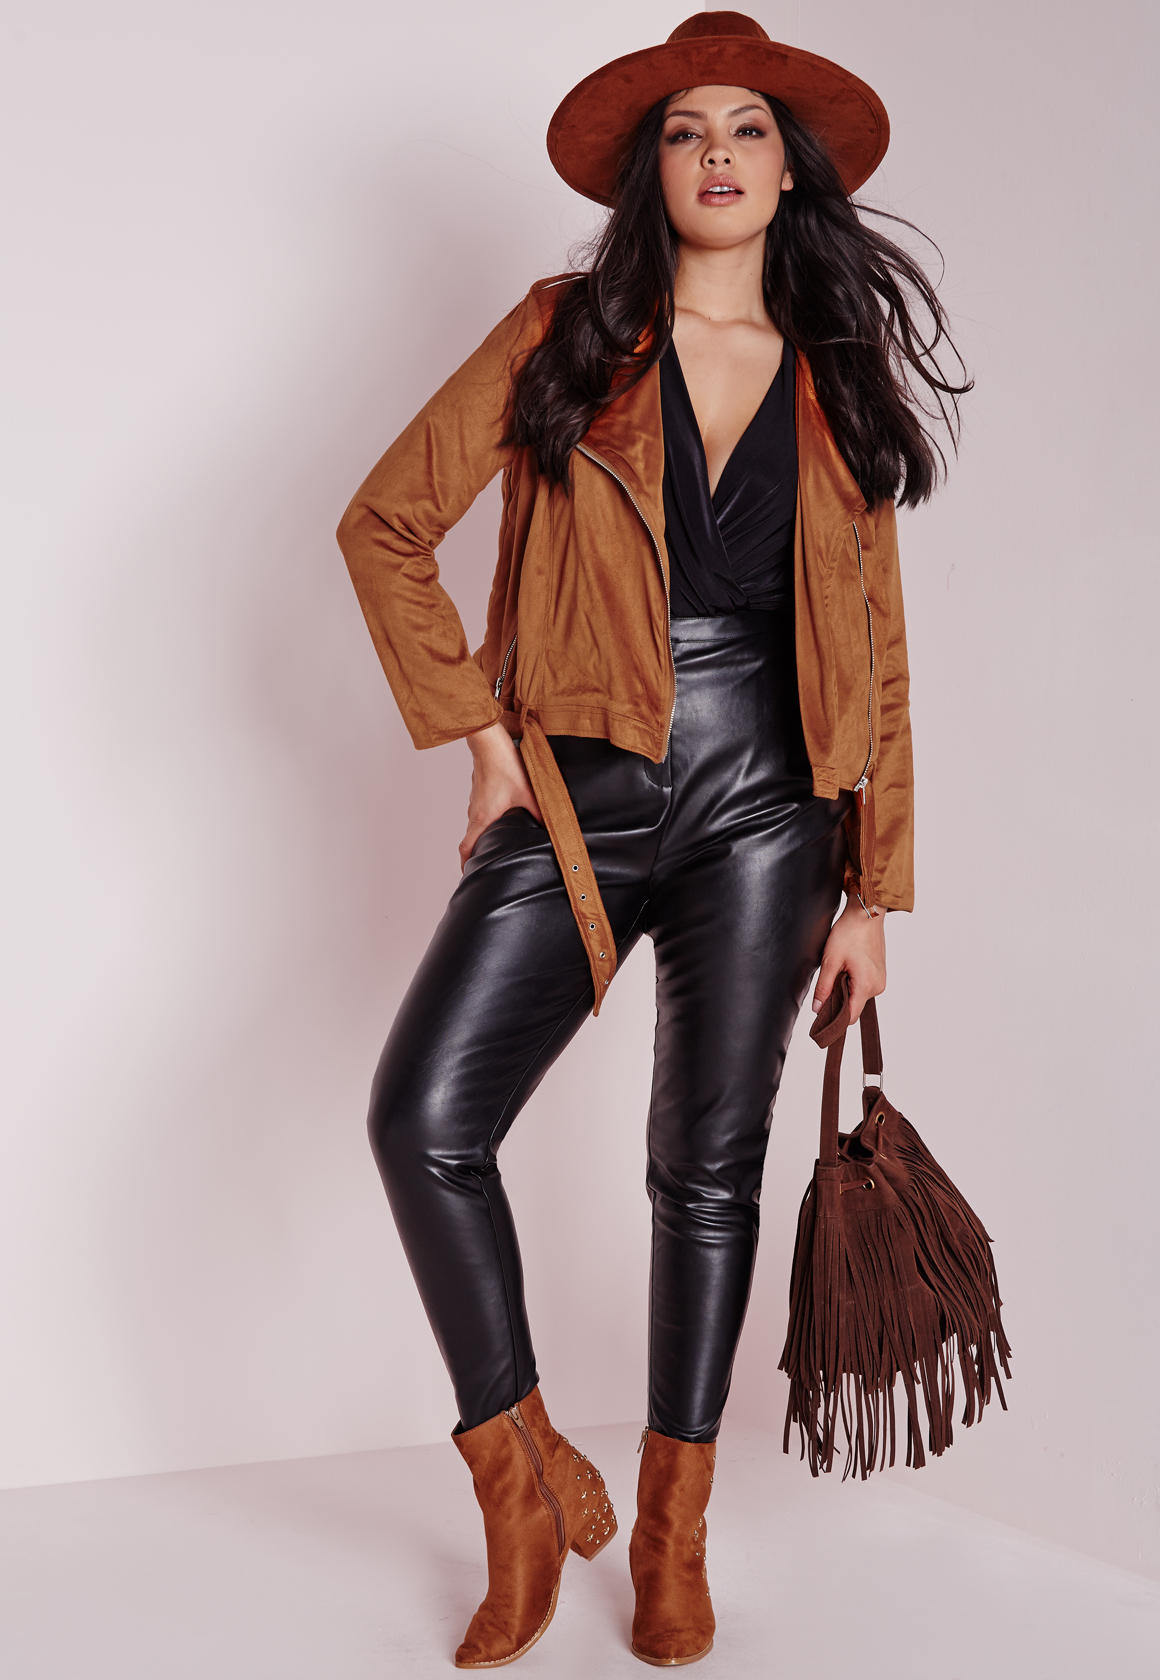 e6c5d216016 Lyst - Missguided Plus Size Faux Suede Biker Jacket Tan in Brown